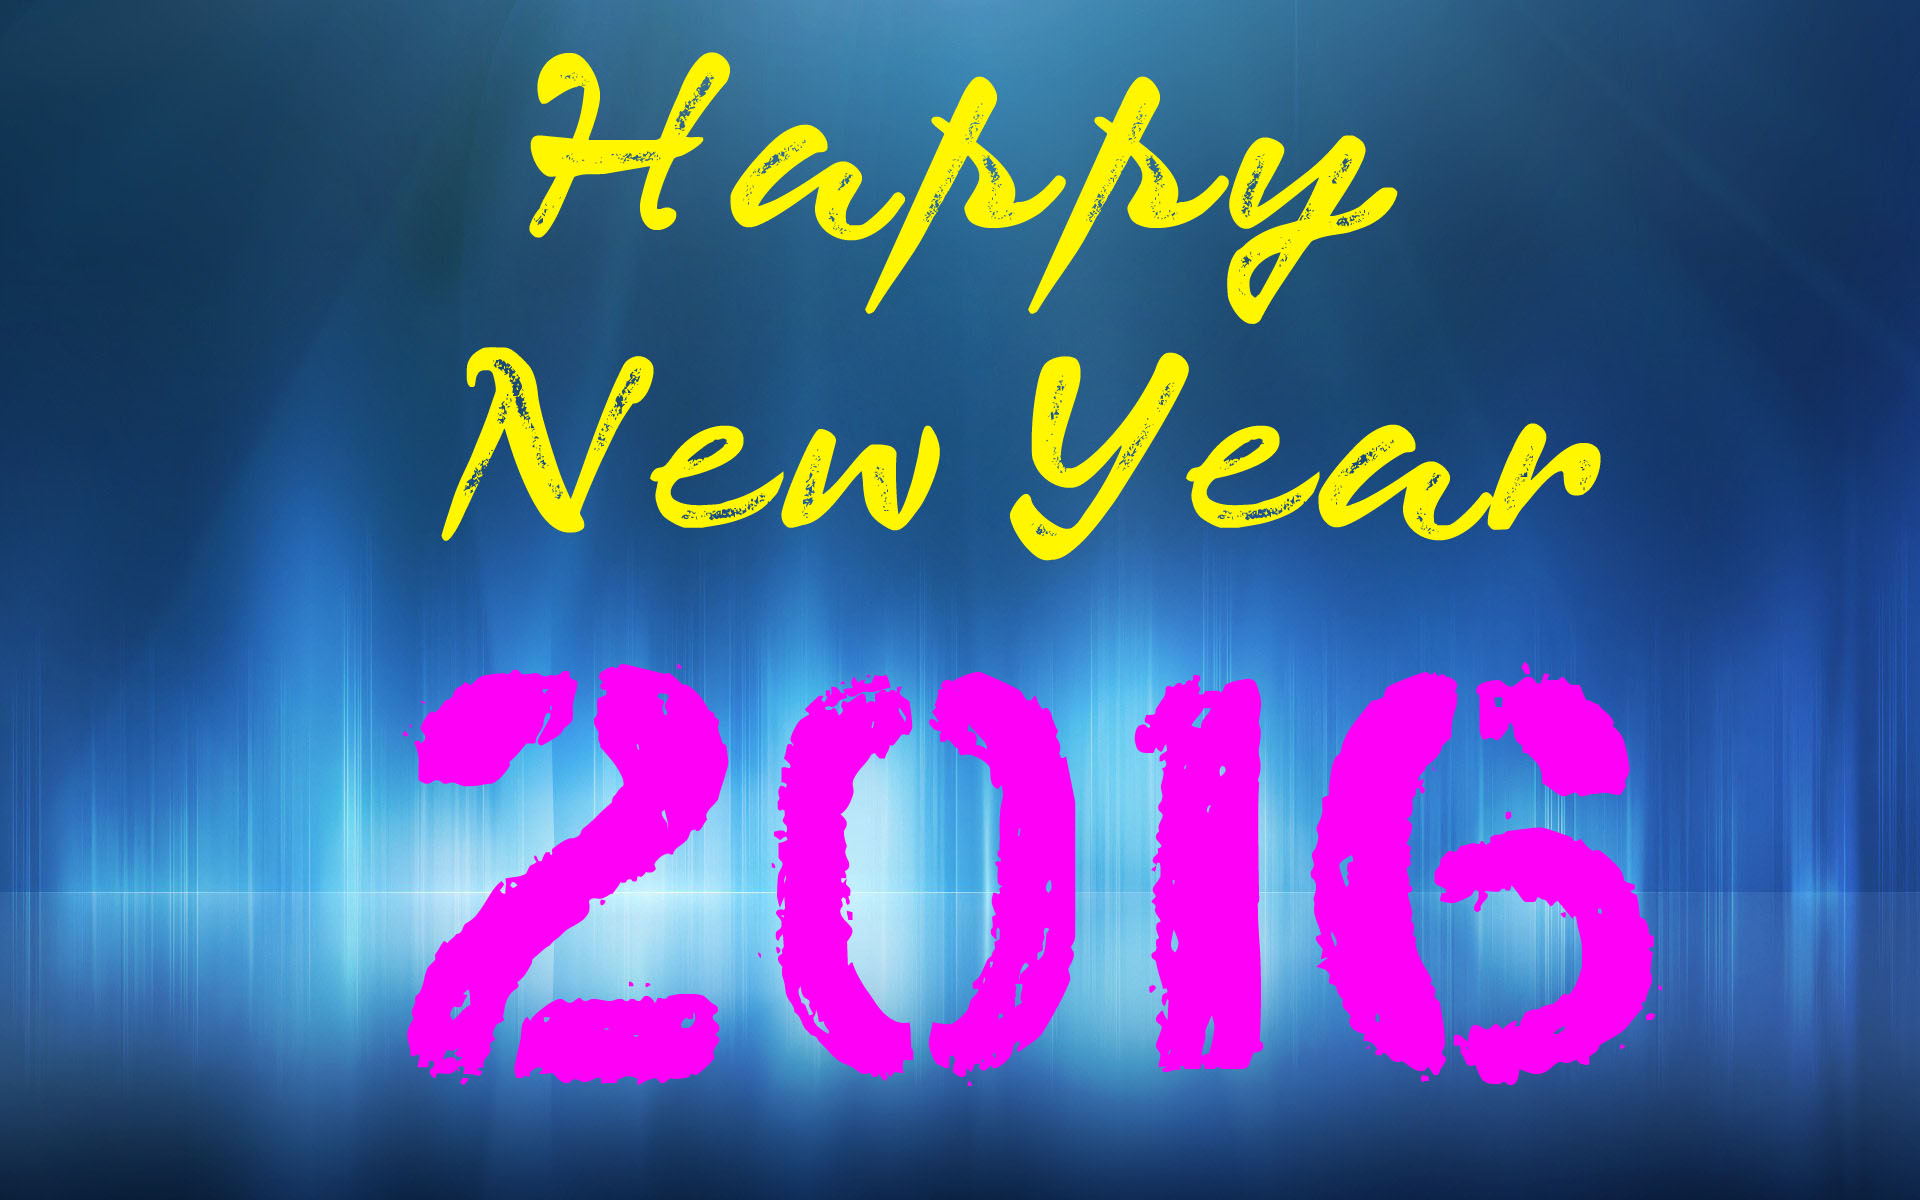 New Year clipart 2016 tamil Ulaska Download clipart Year Clip